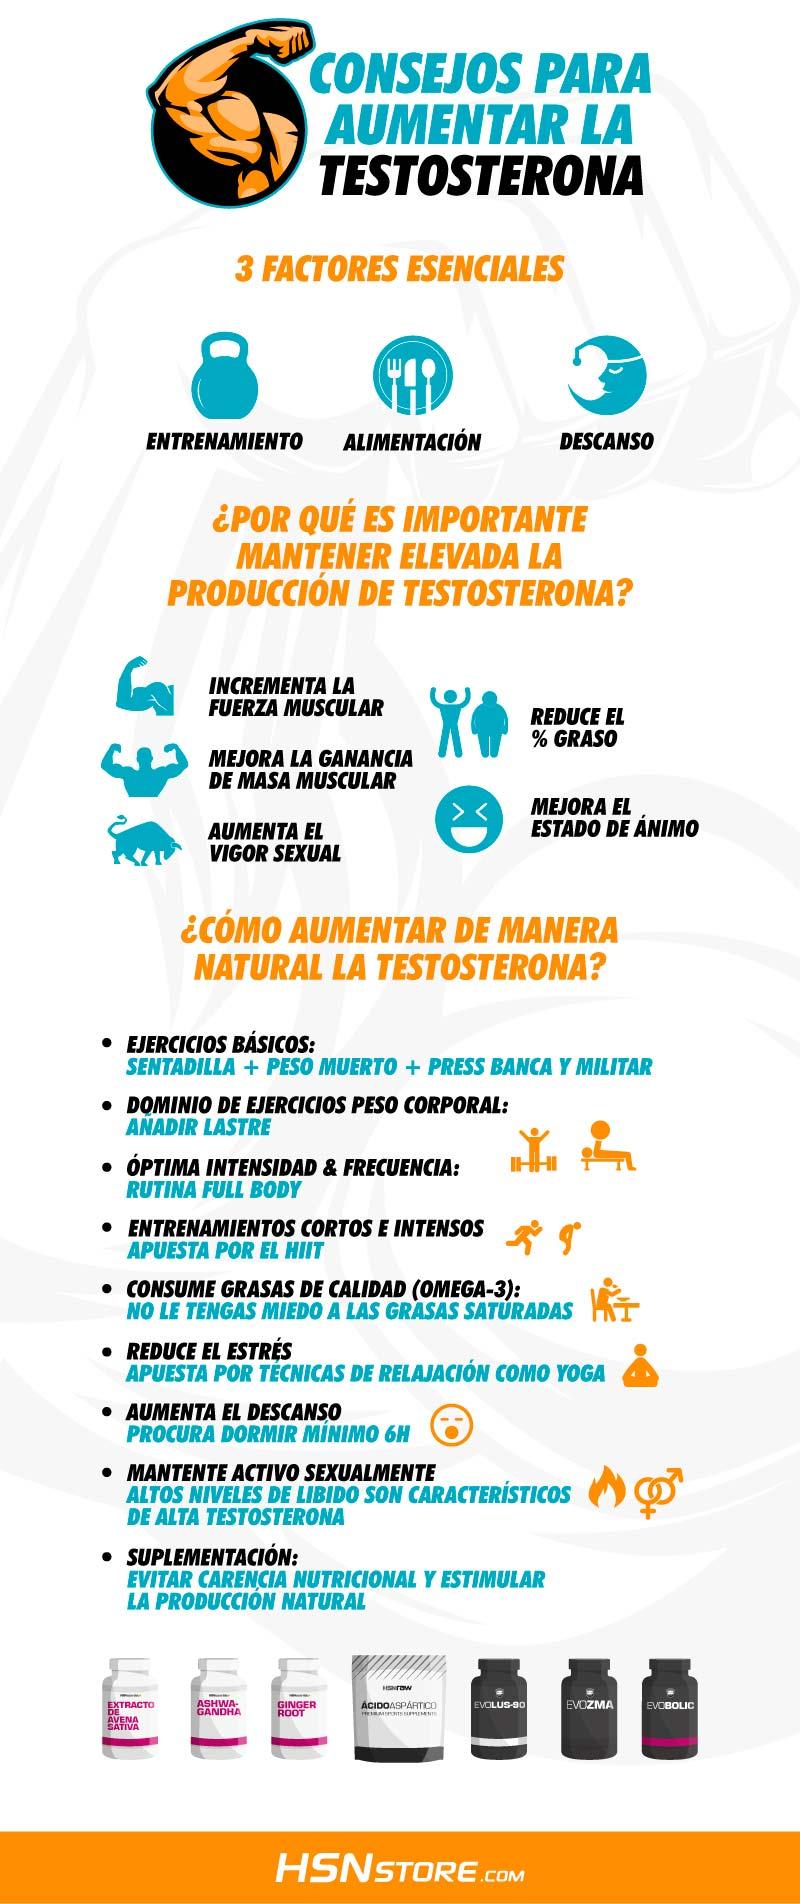 Aumentar la Testosterona de Manera Natural